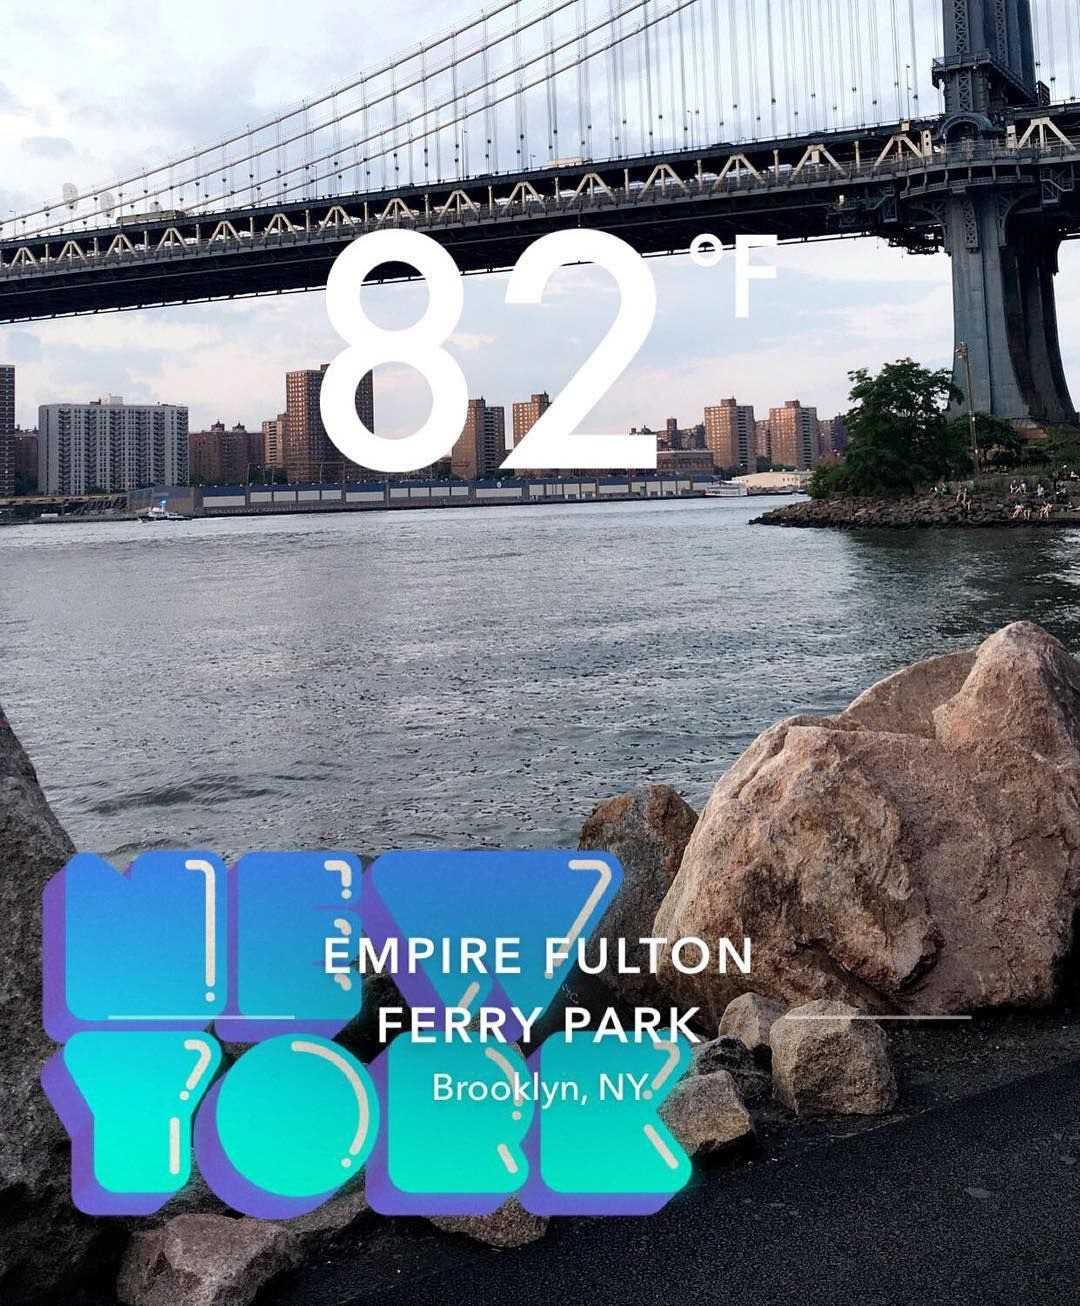 I'm on a New York State of Mind #newyork #newyorkcity #brooklynbridge #brooklyn #nycferry #nycferryride #ferry #ferryride #k3vinenvoy